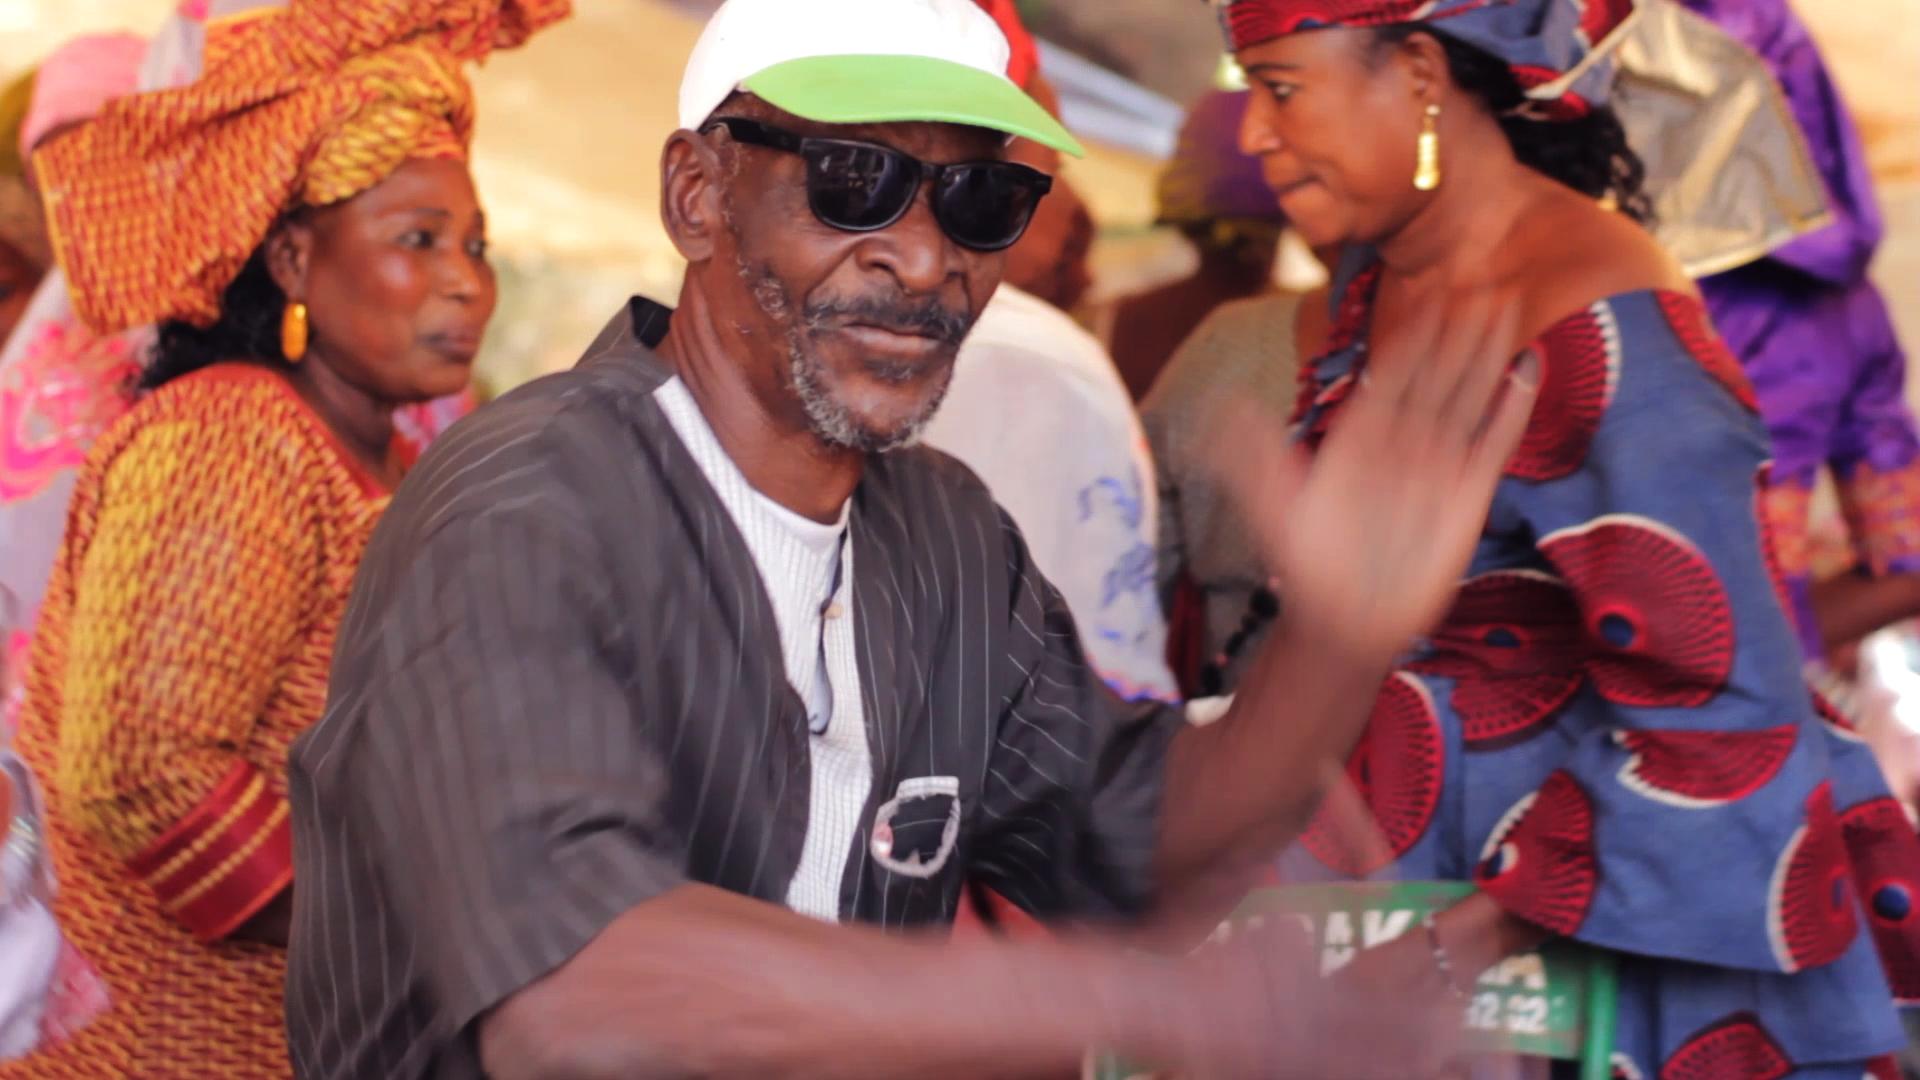 djembe mariage segou pablocaminante - Malí 3, Ségou